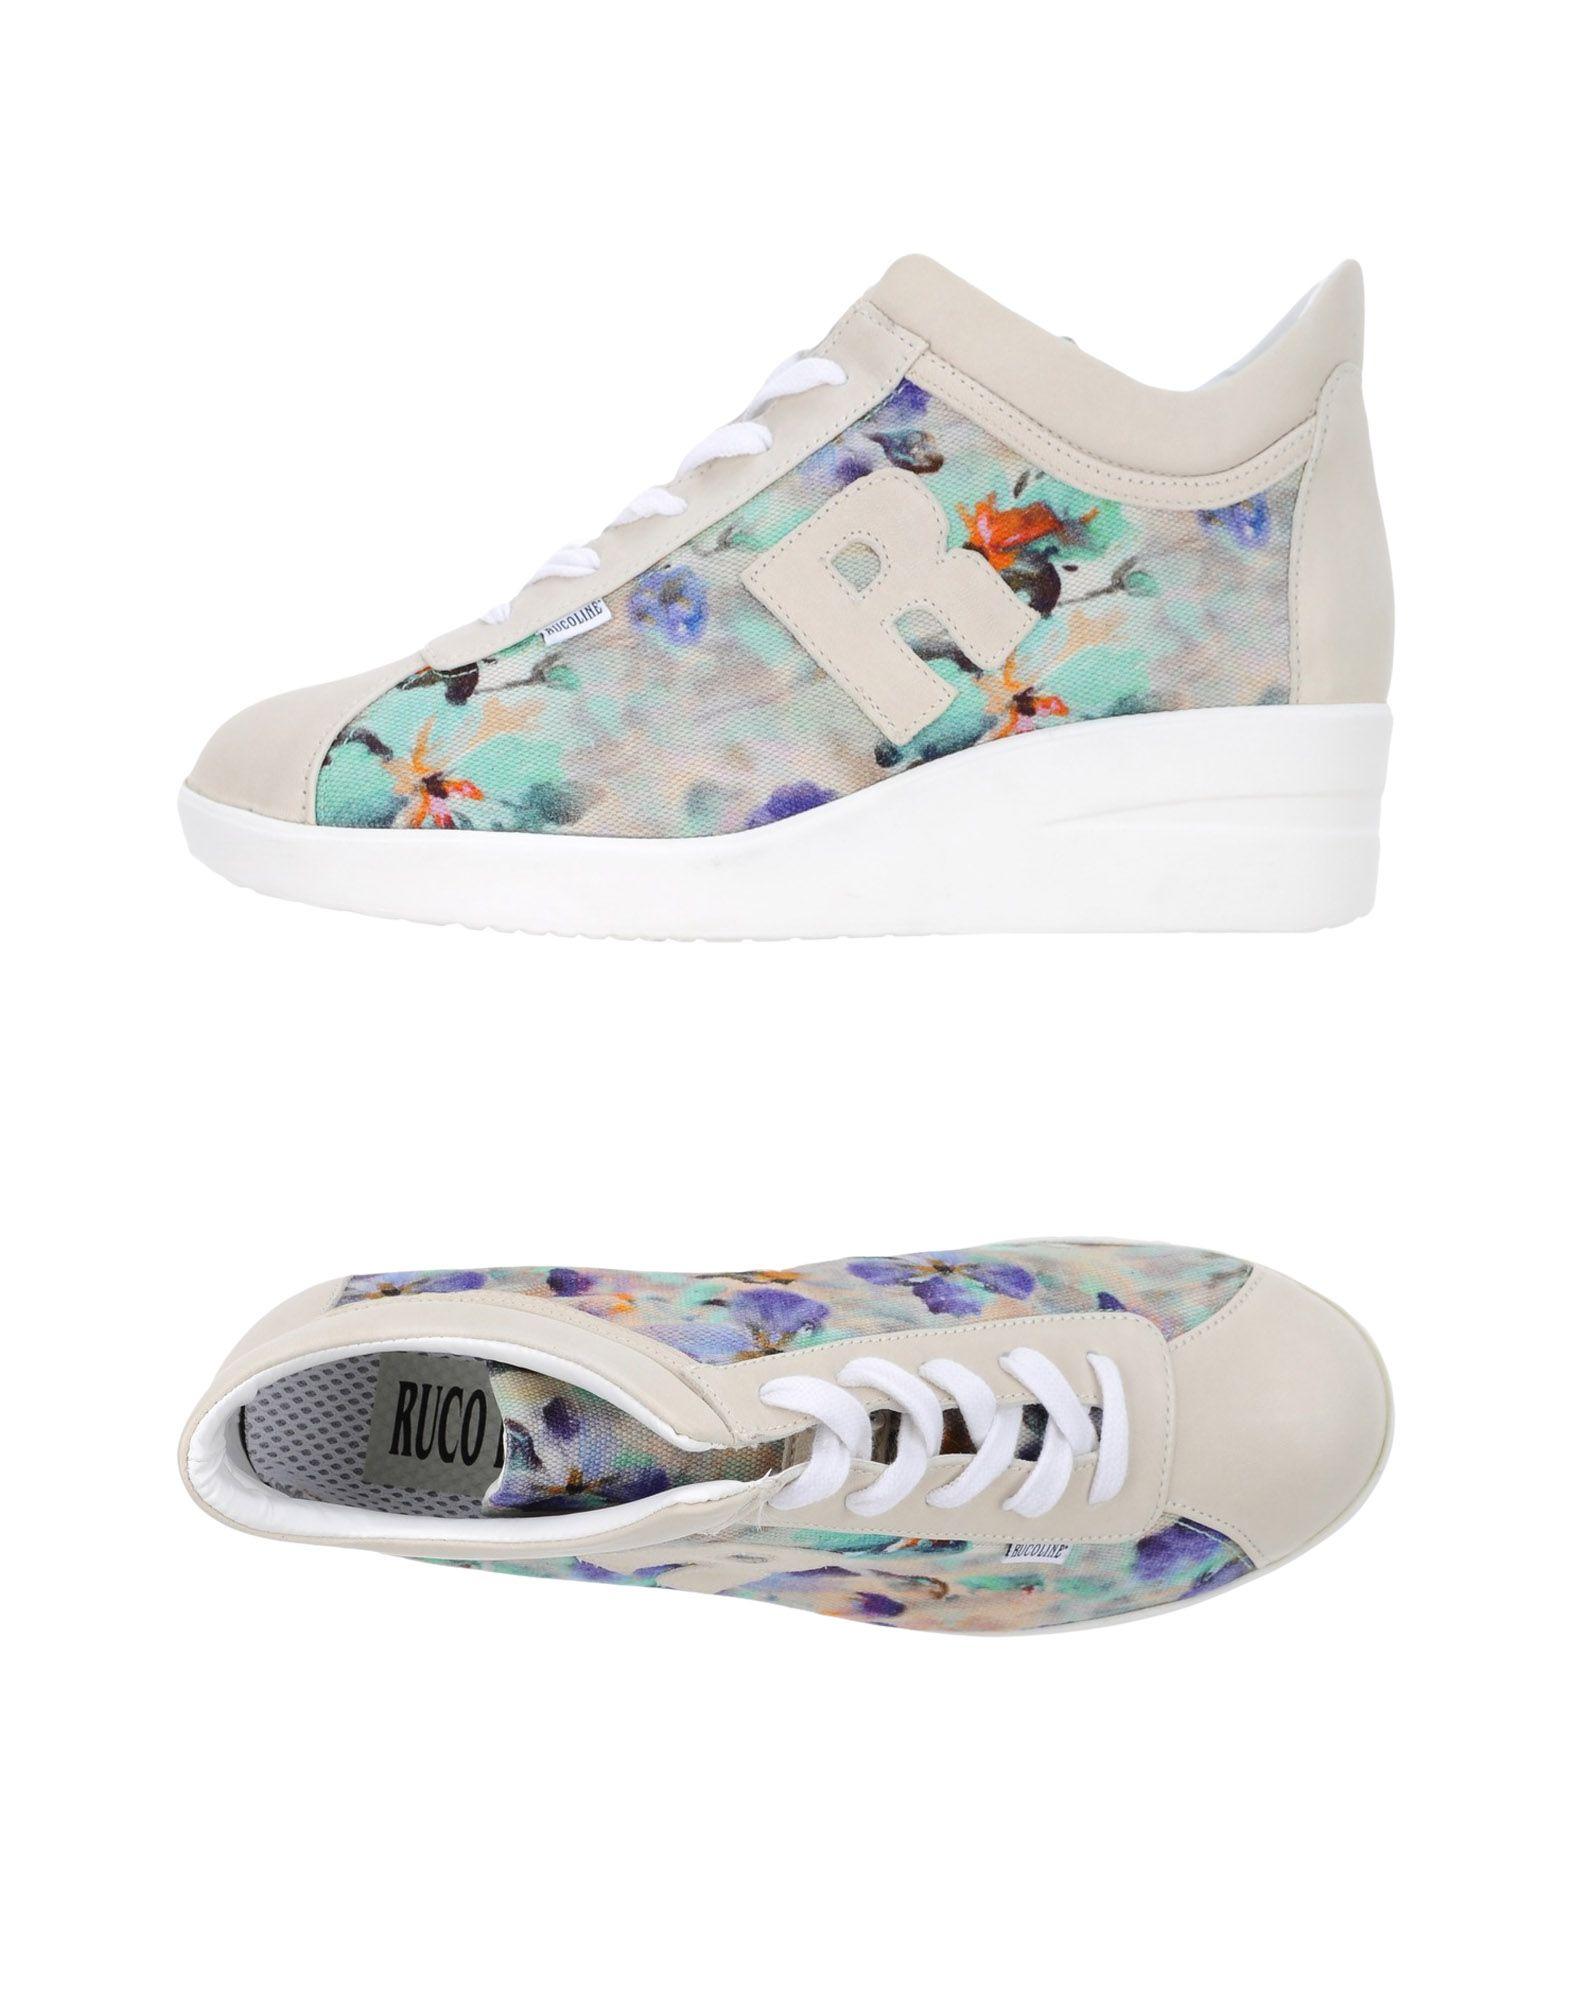 Ruco Line Sneakers Damen  11334994QH Gute Qualität beliebte Schuhe